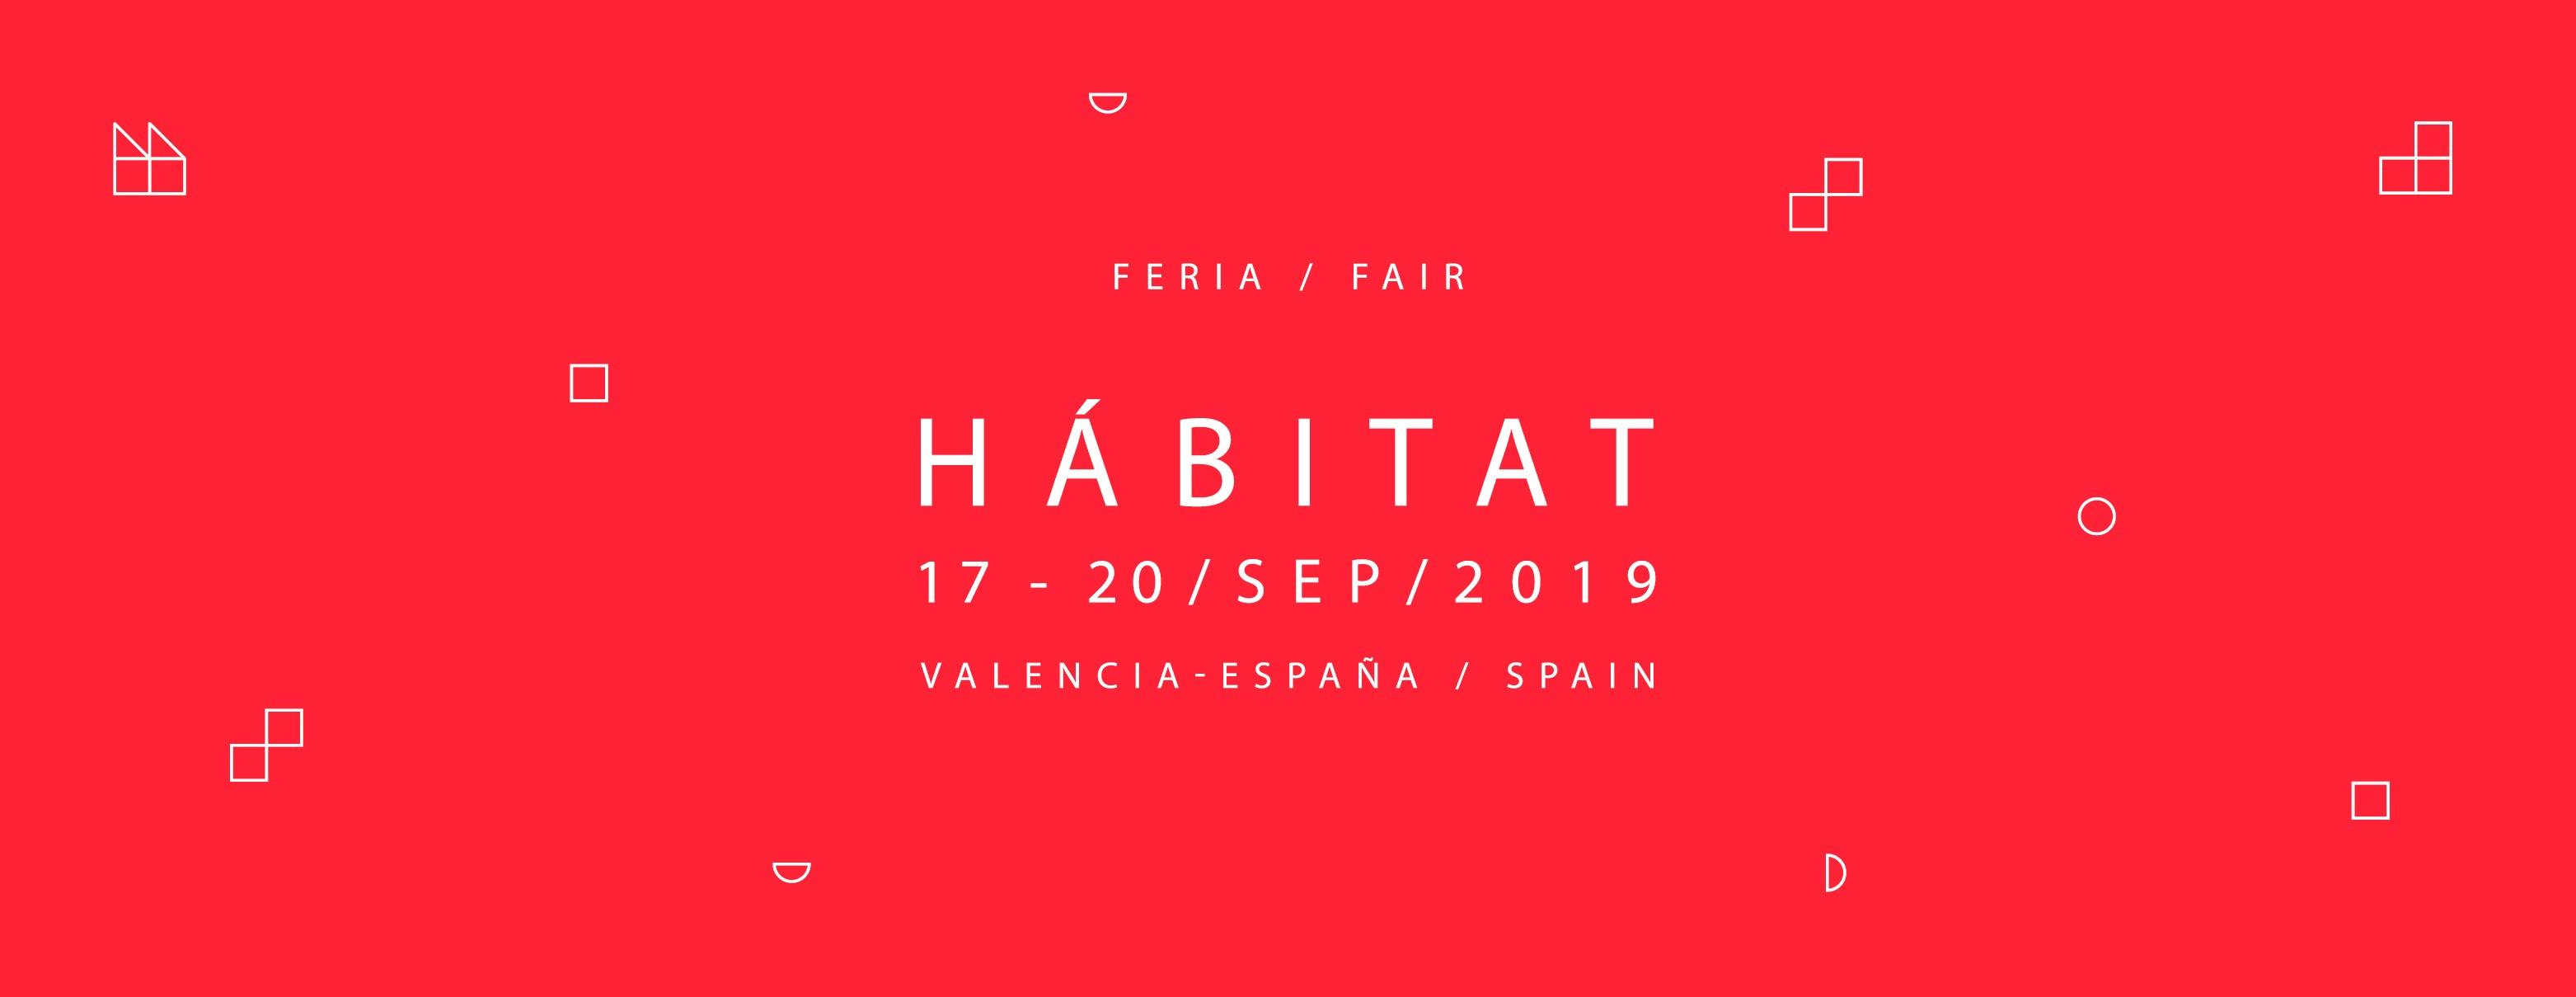 habitat-valencia-2019-comunidad-valenciana